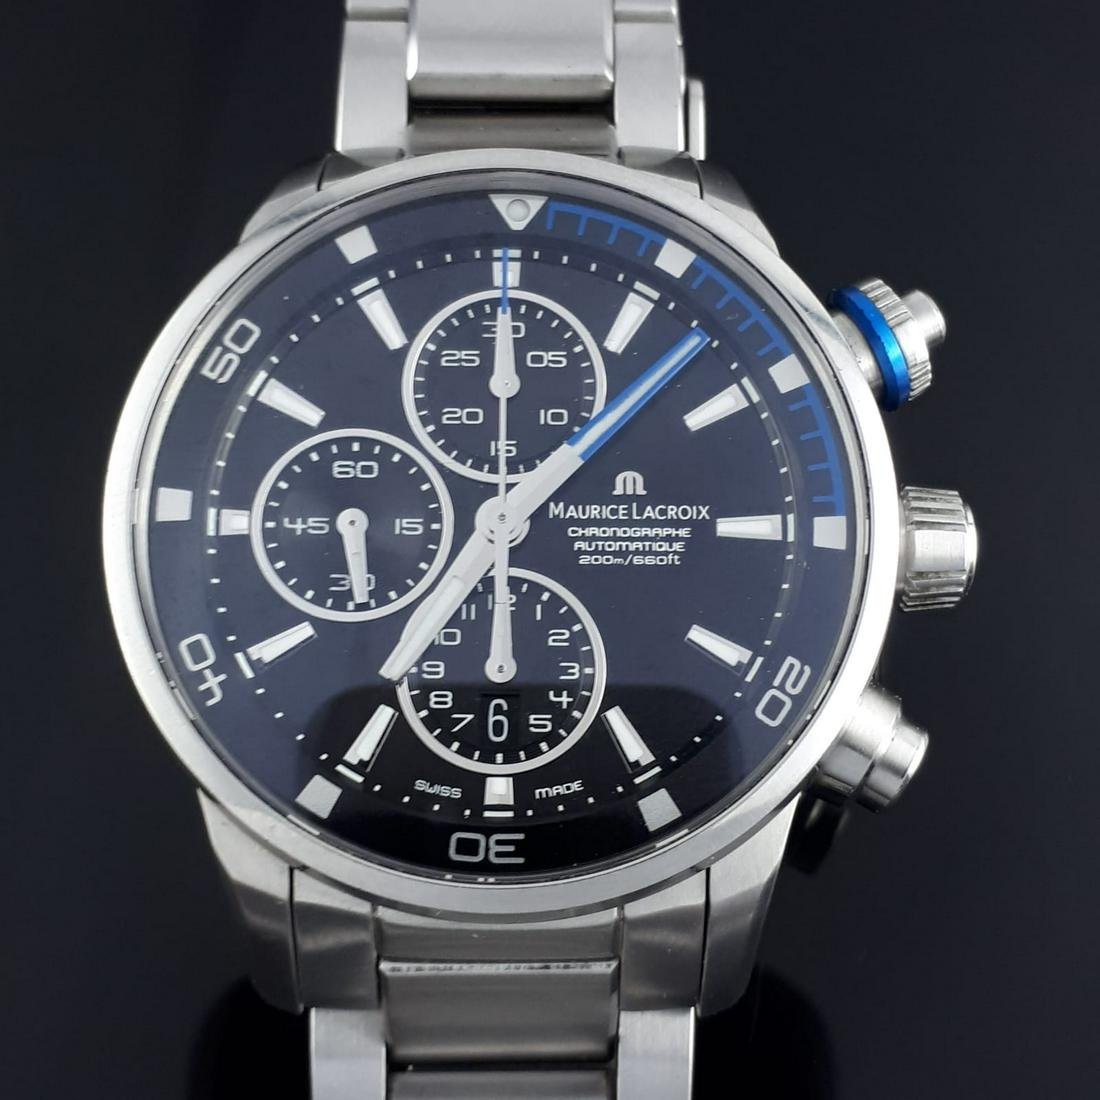 Maurice Lacroix - Pontos S Chronograph, Date, Blue -